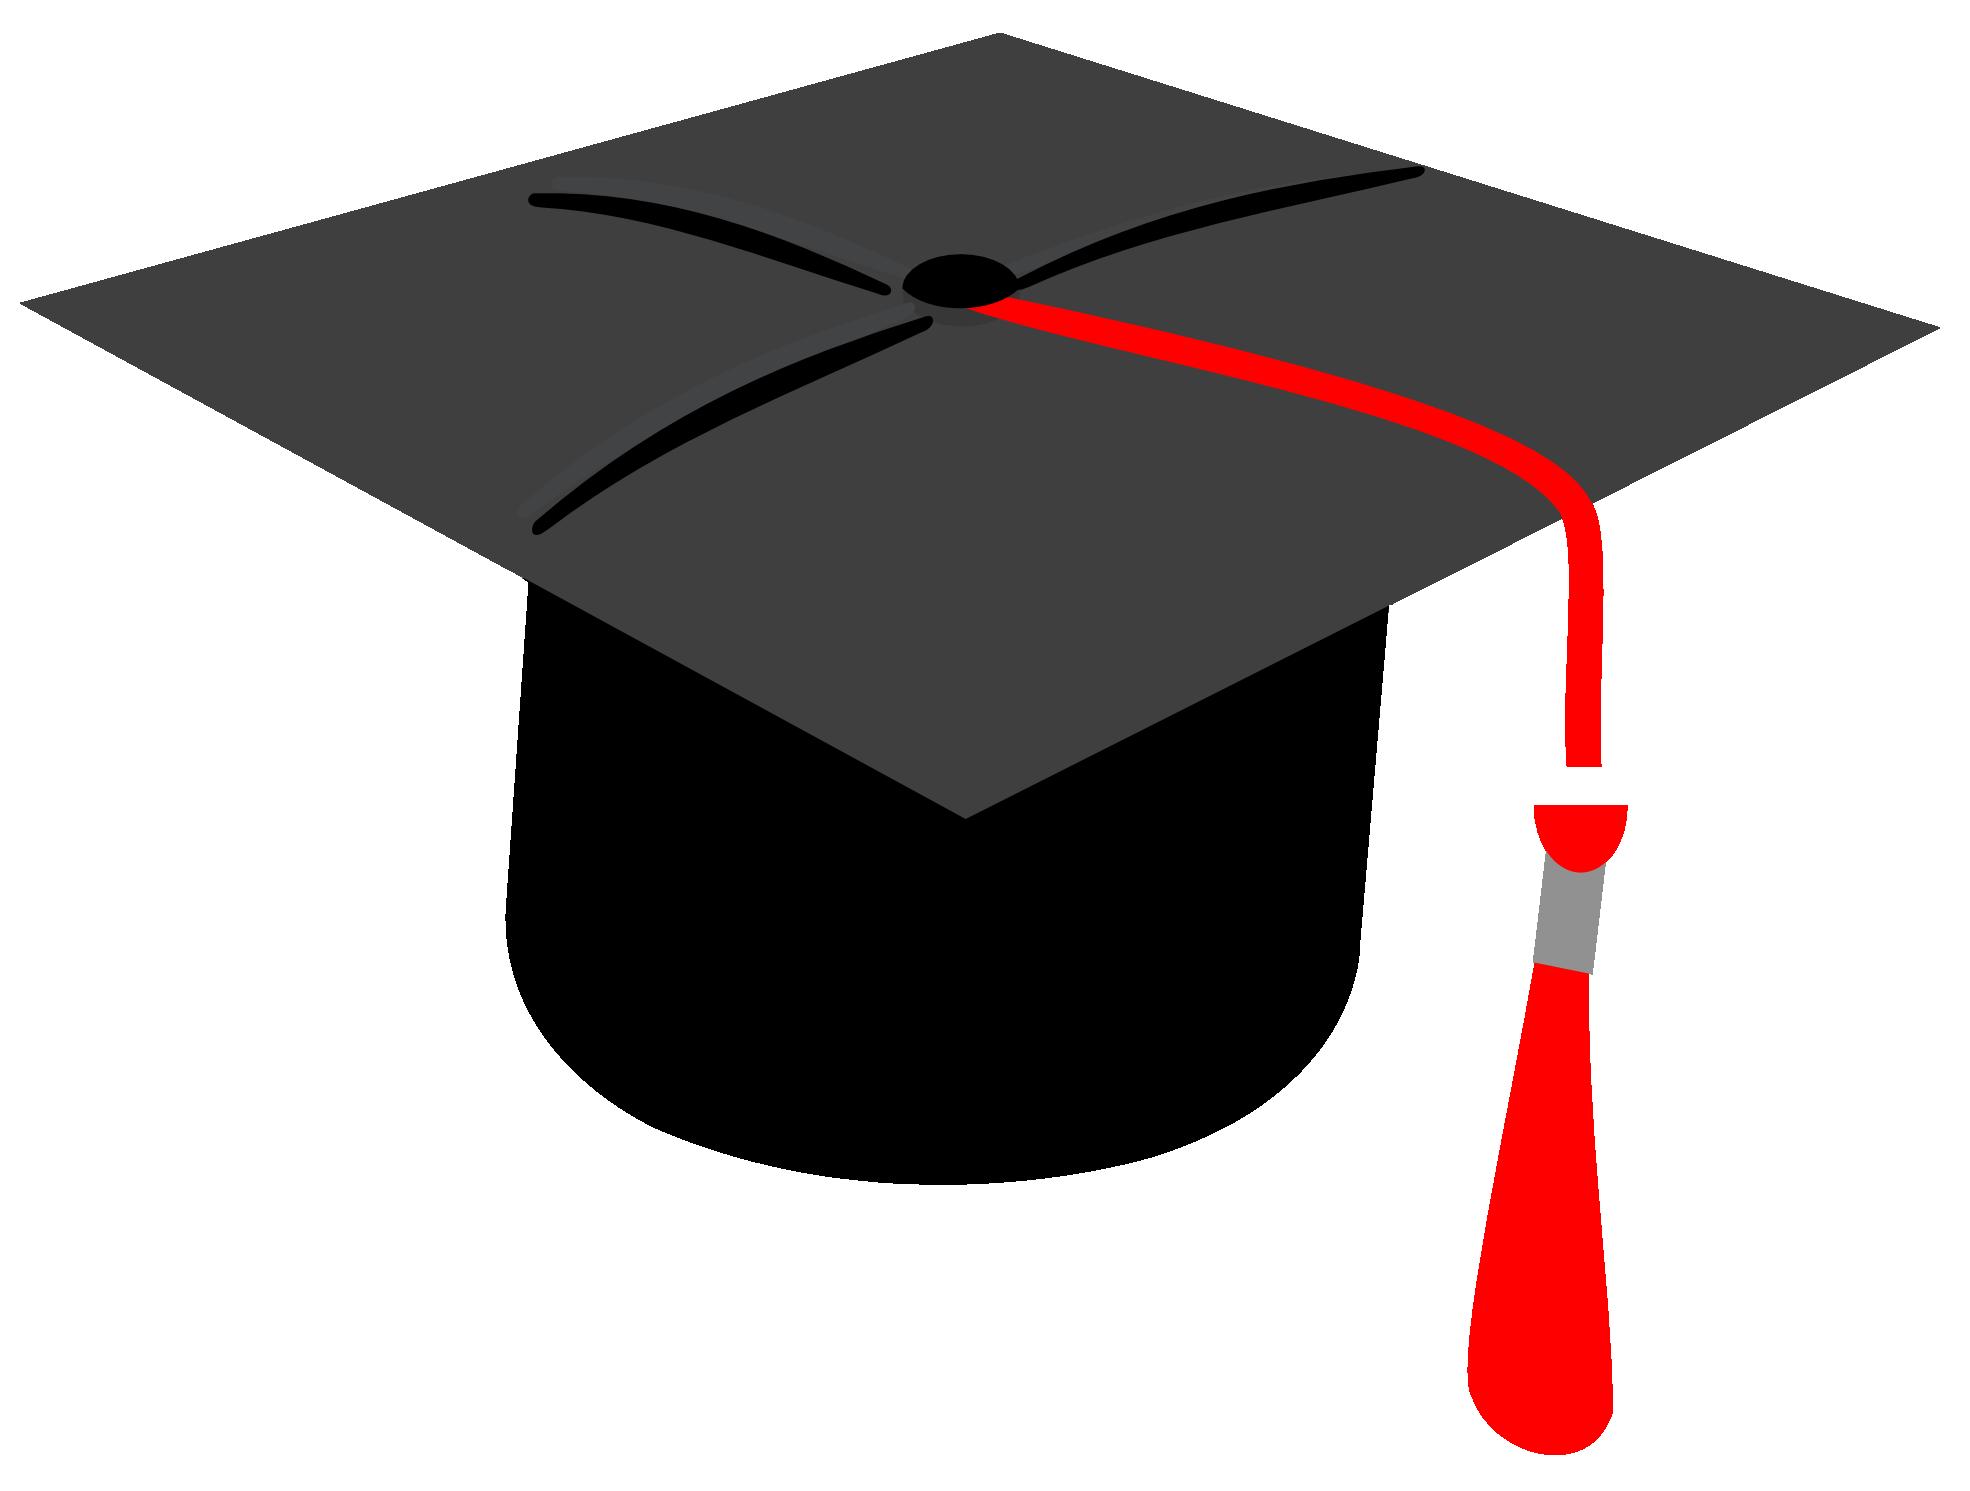 High school graduation clipart clip freeuse library Graduation Cap PNG Image - PurePNG | Free transparent CC0 PNG Image ... clip freeuse library